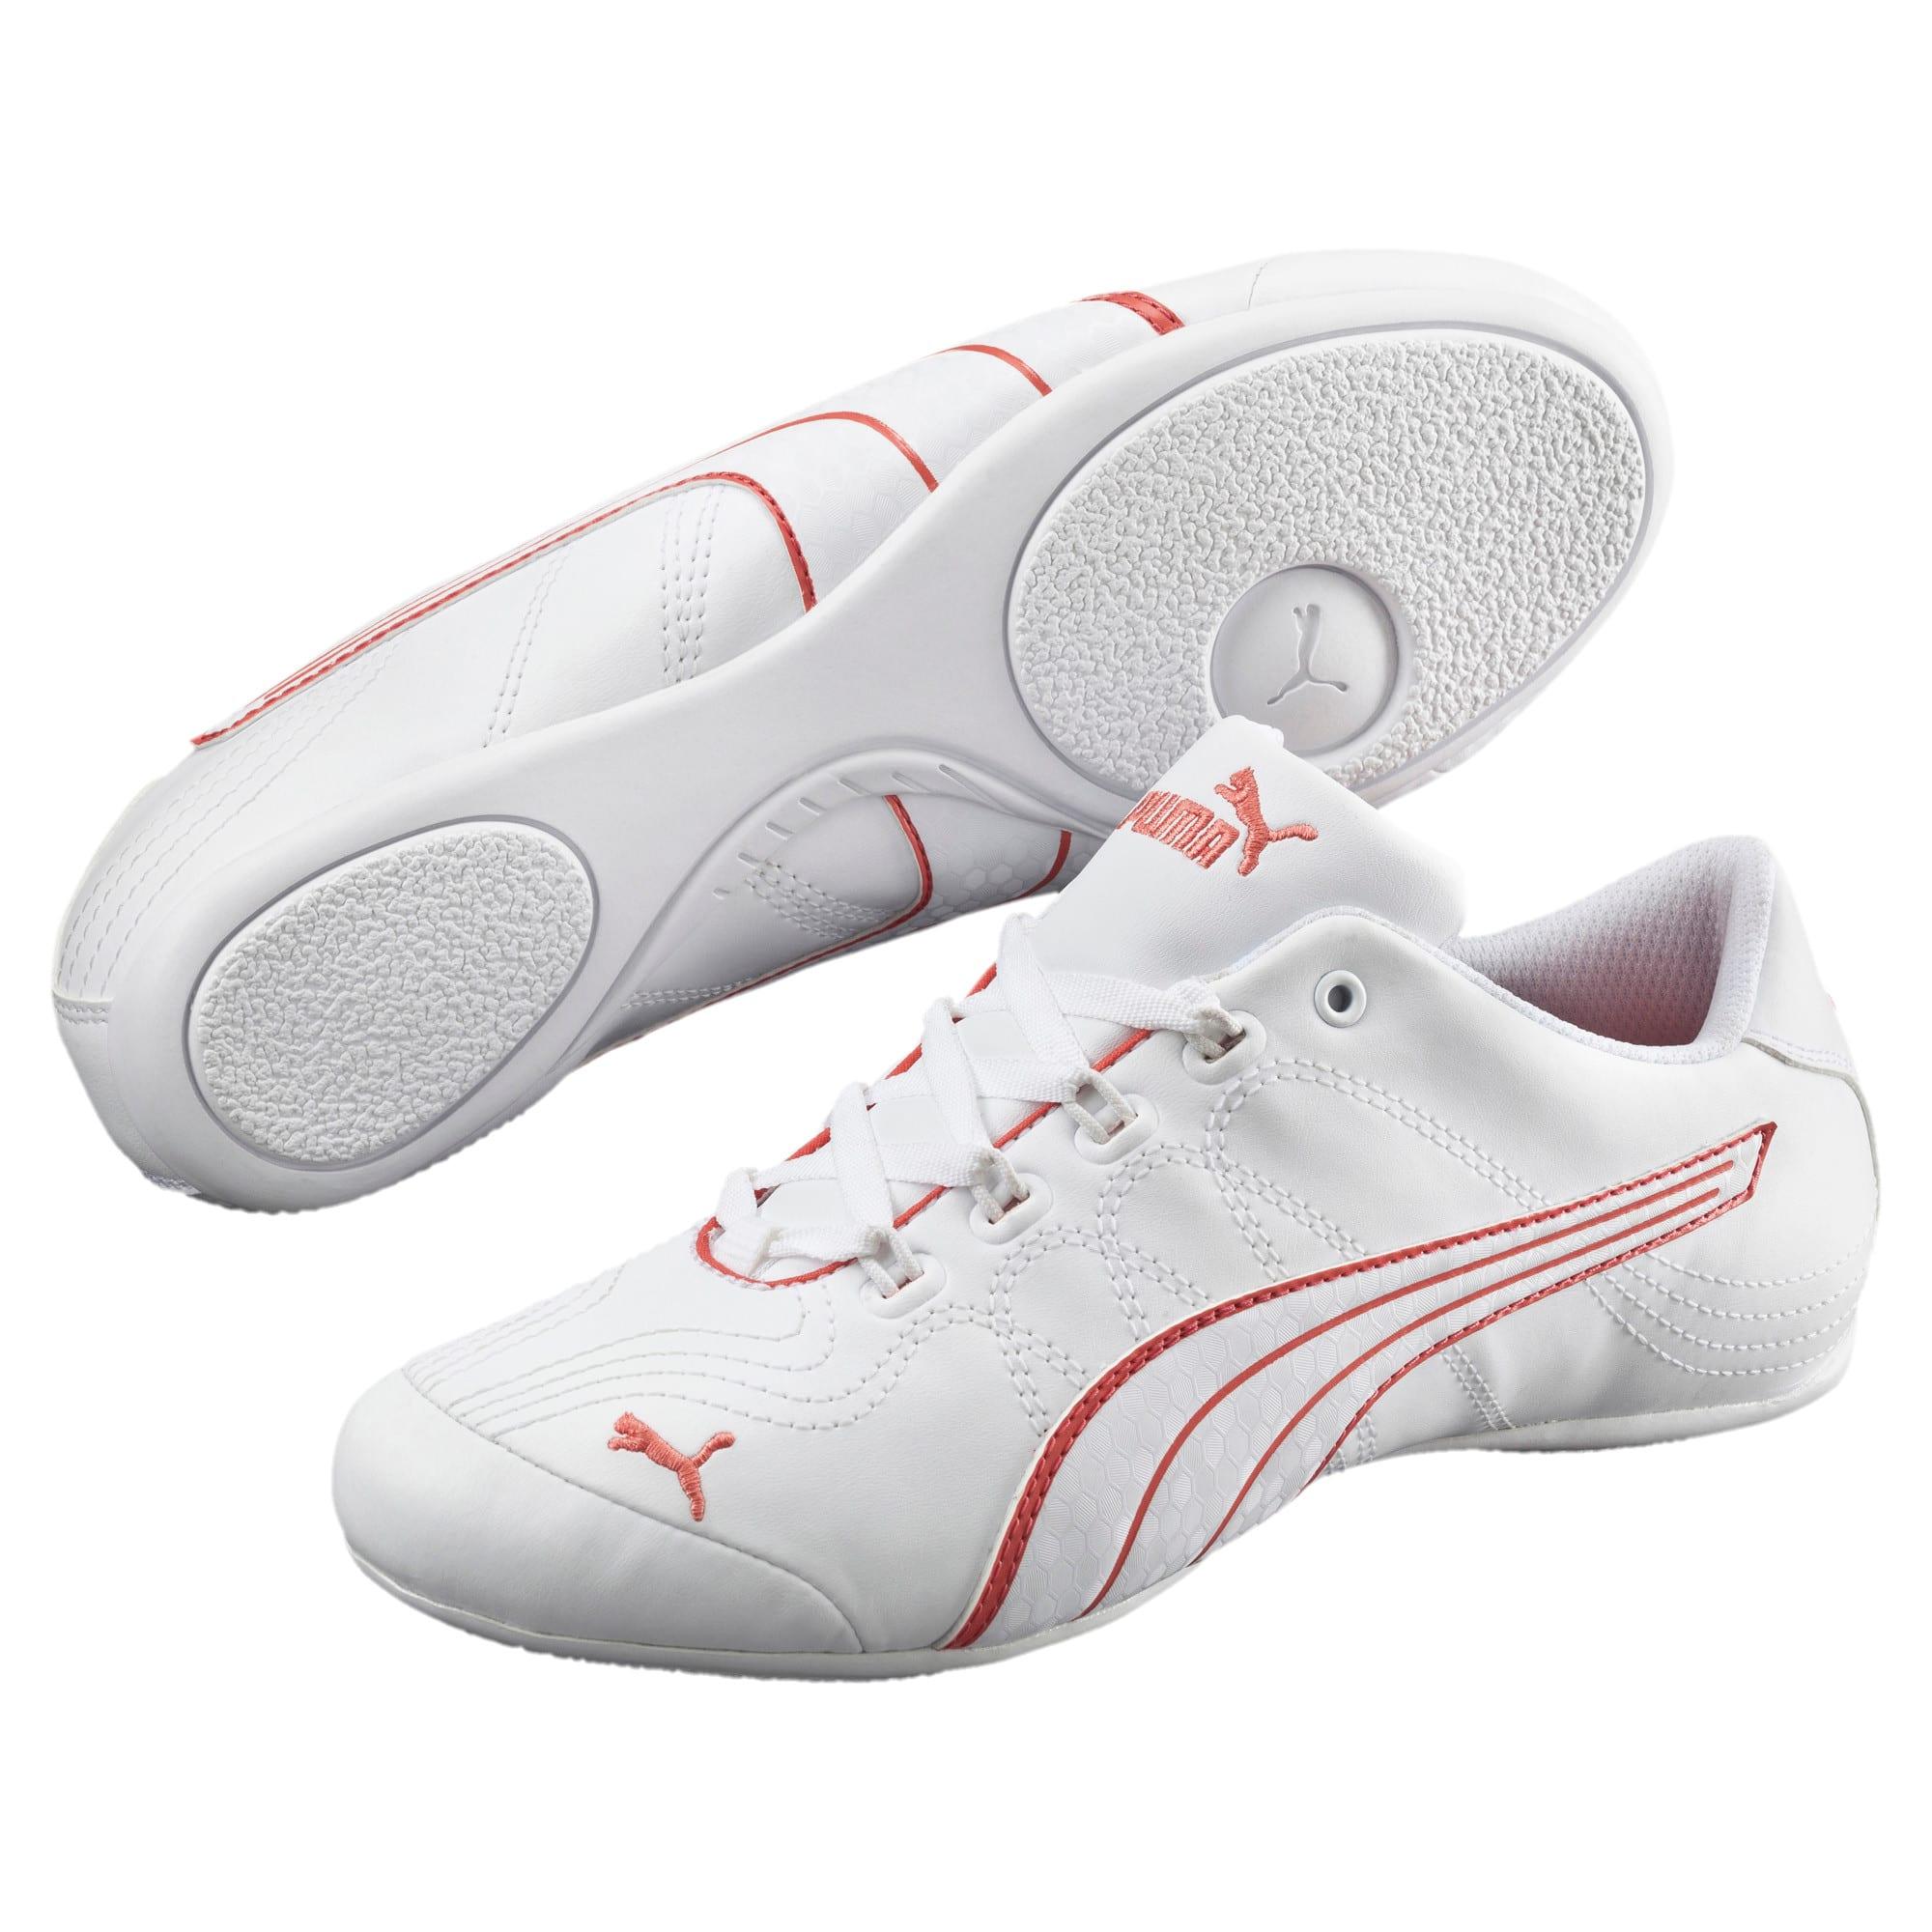 official supplier timeless design variousstyles Soleil v2 Comfort Fun Women's Sneakers